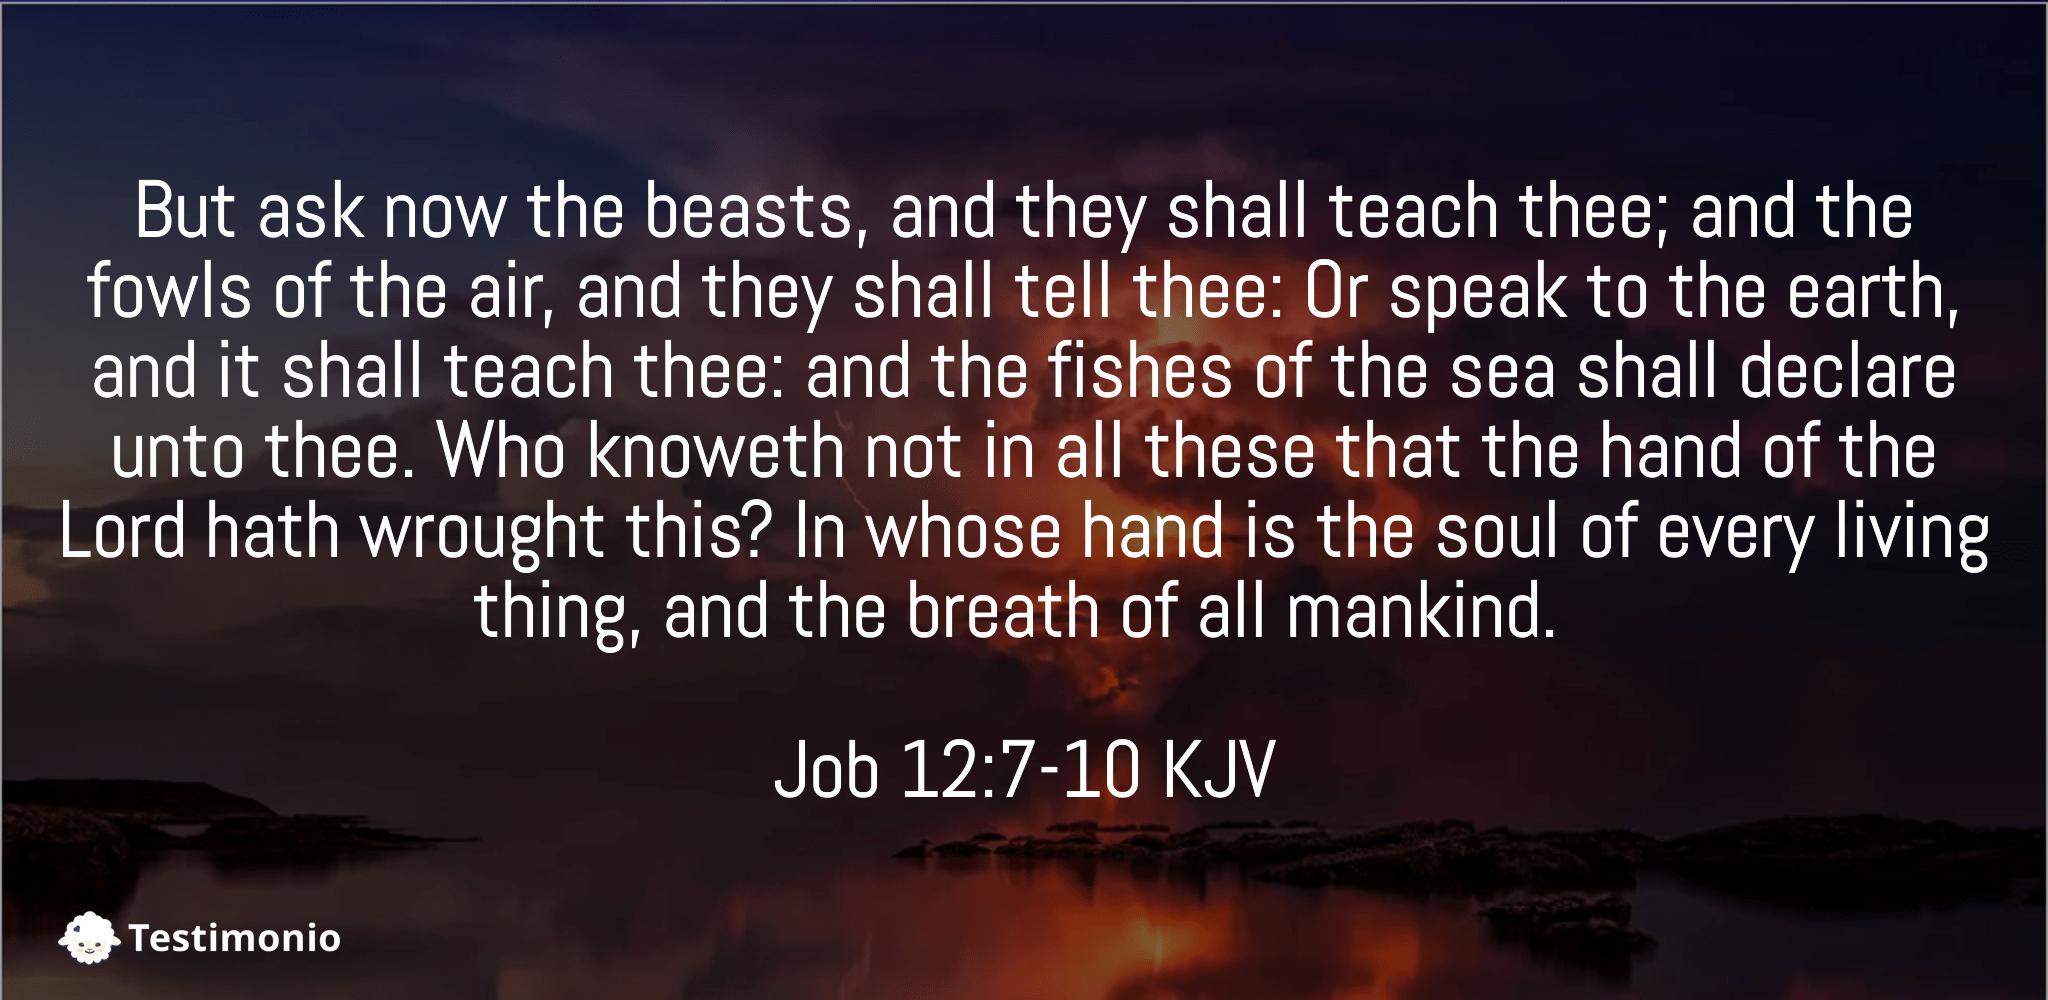 Job 12:7-10